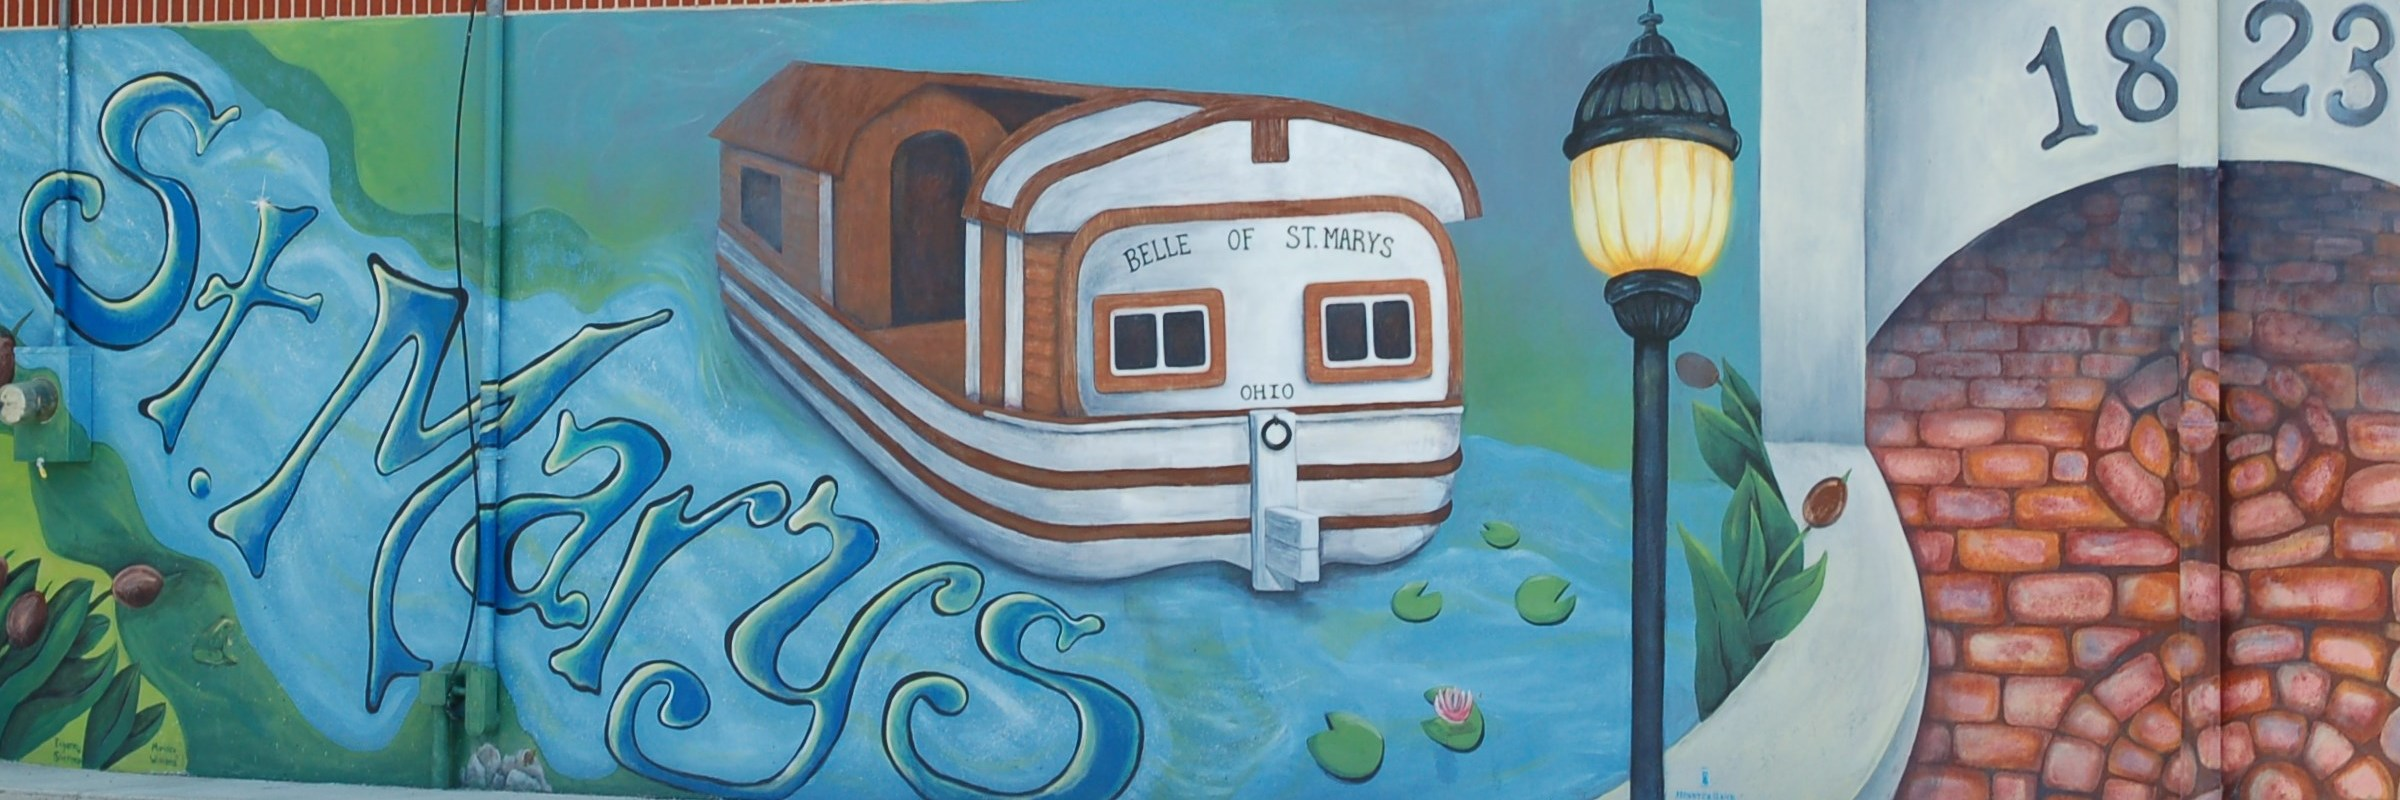 Utility-Bldg-Mural-w2400.jpg